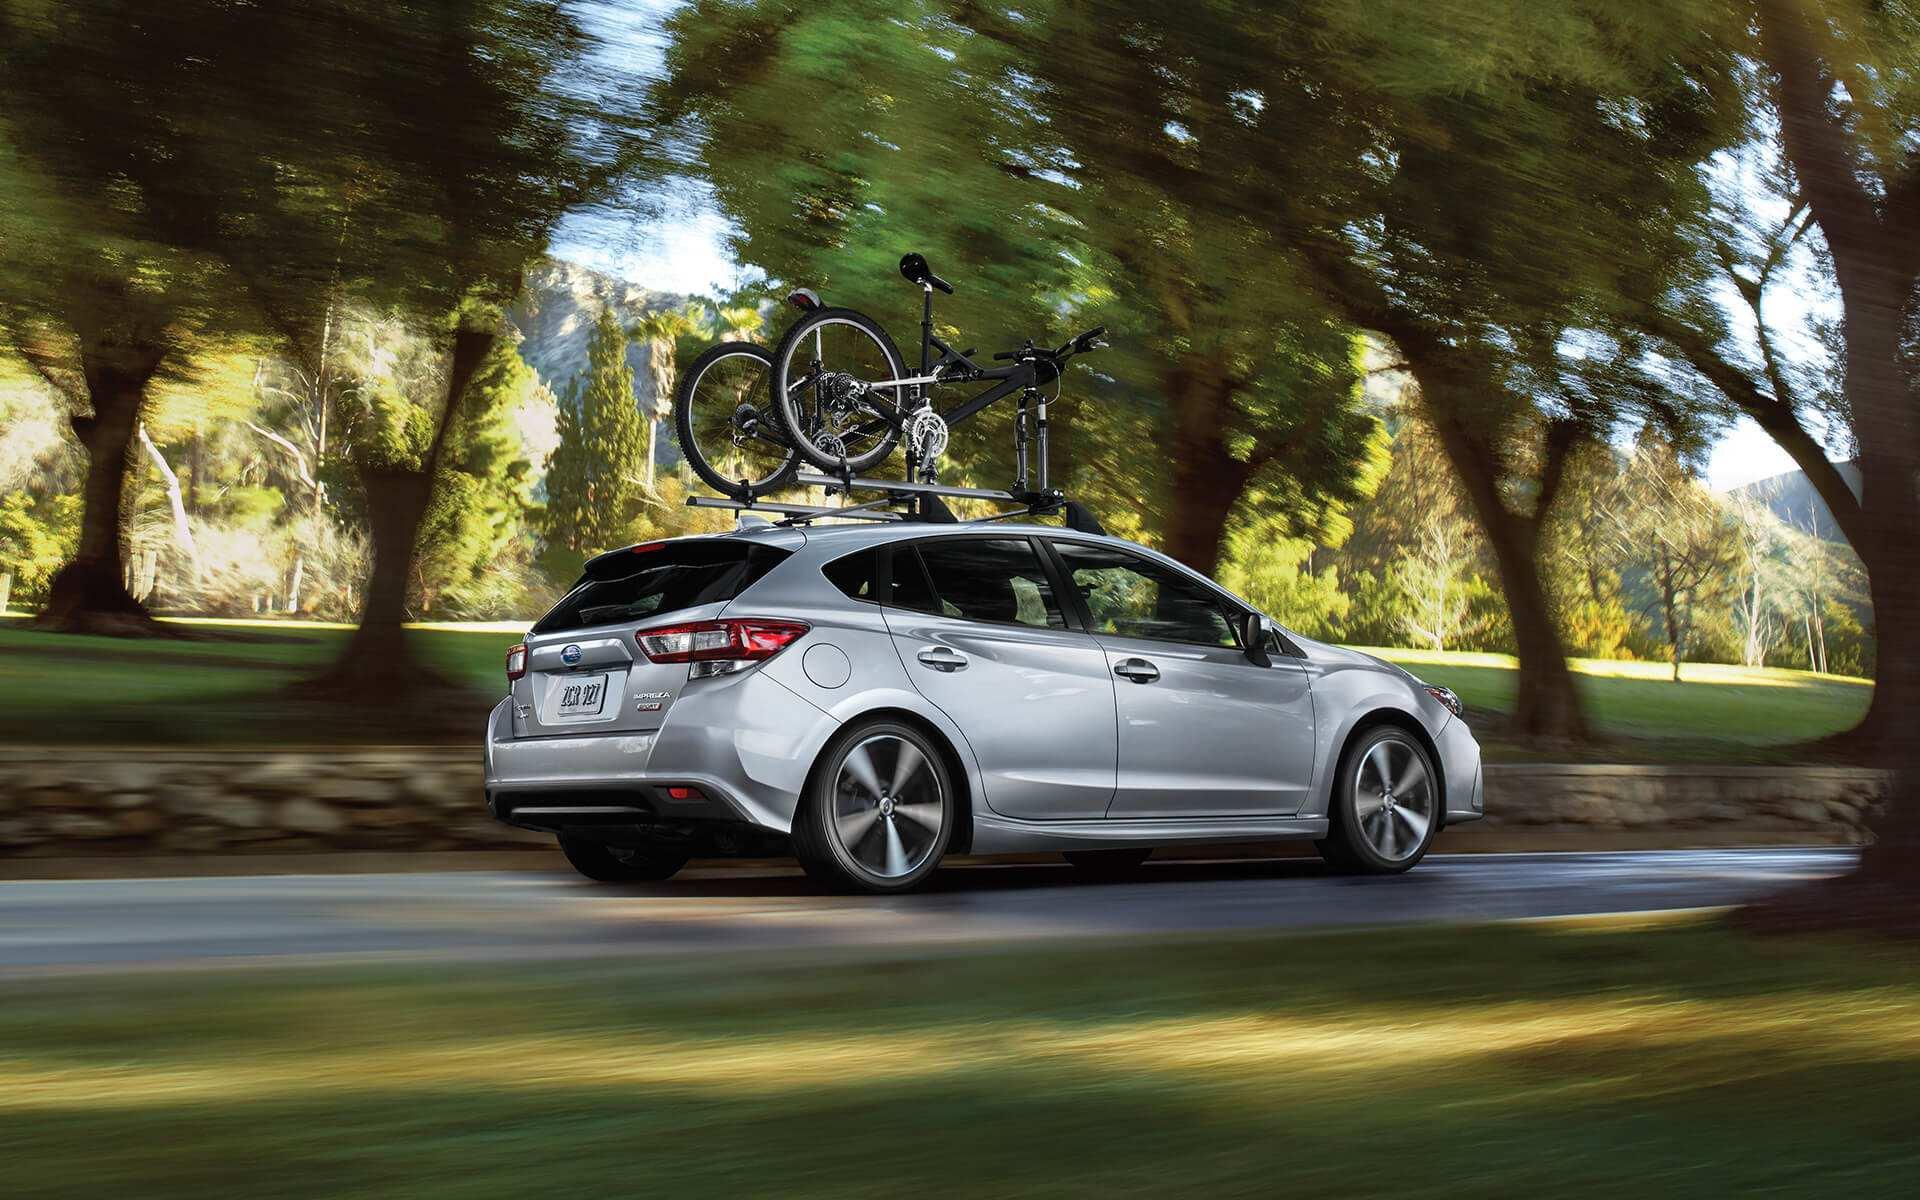 38 Great Subaru 2019 Hatchback Ratings with Subaru 2019 Hatchback